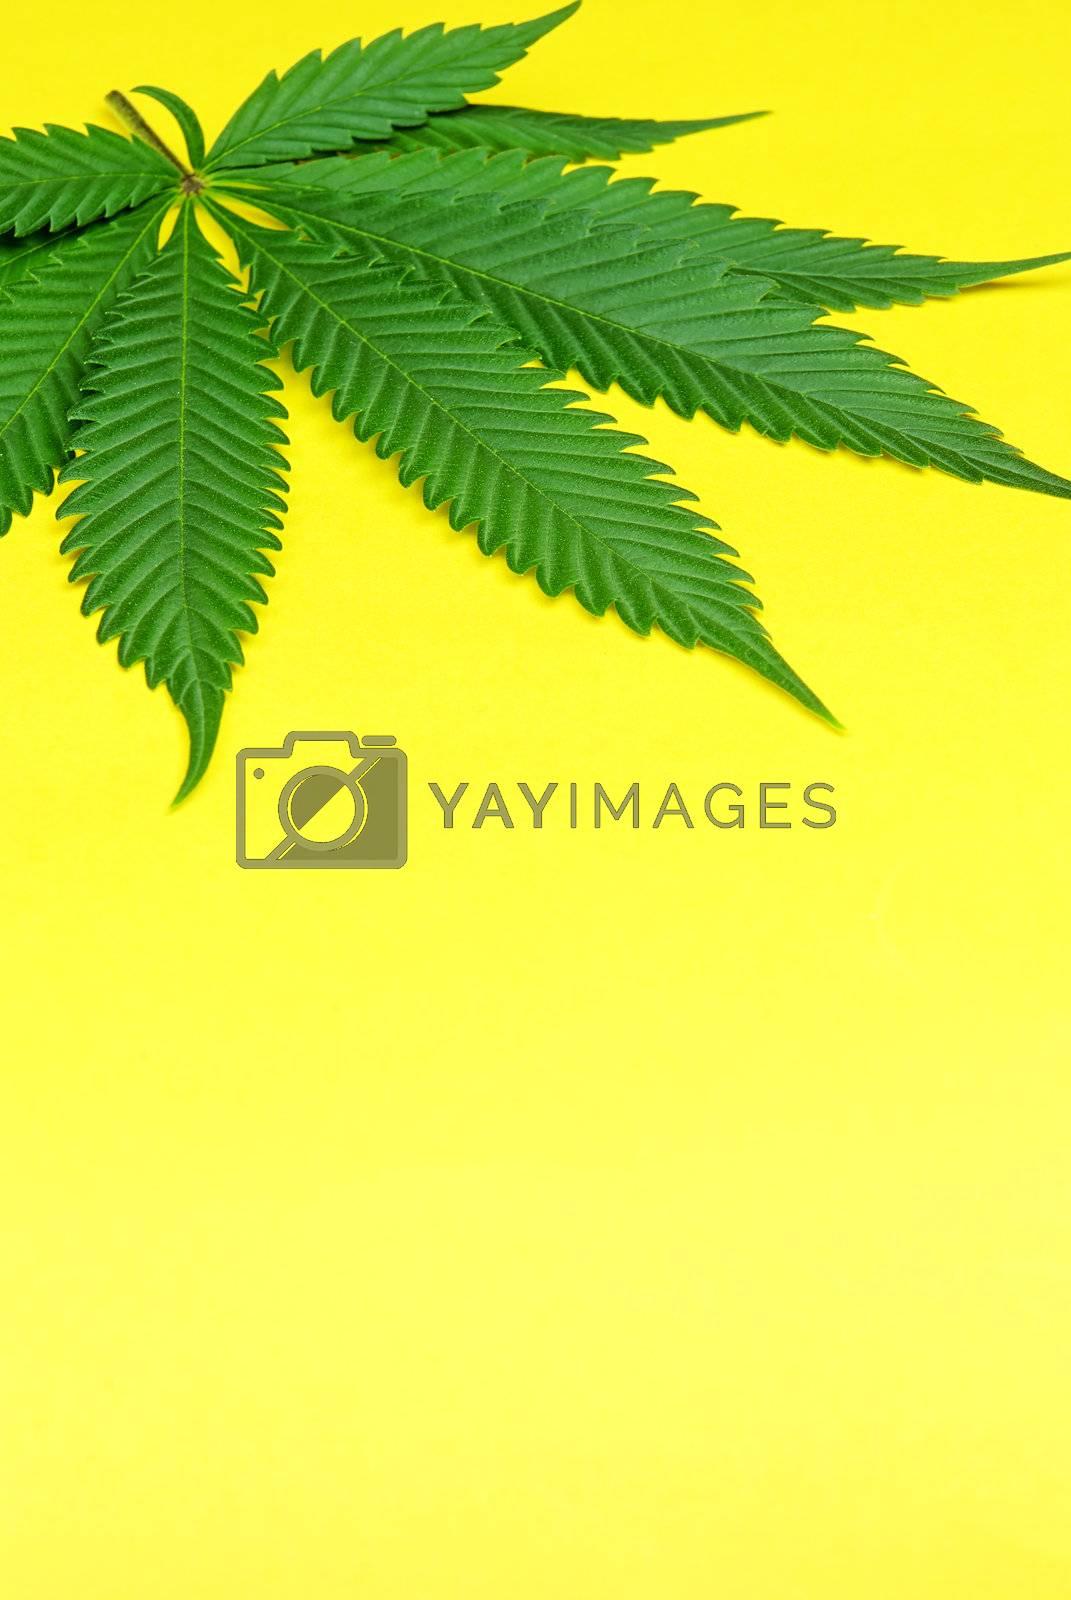 Marijuana leaf by massman